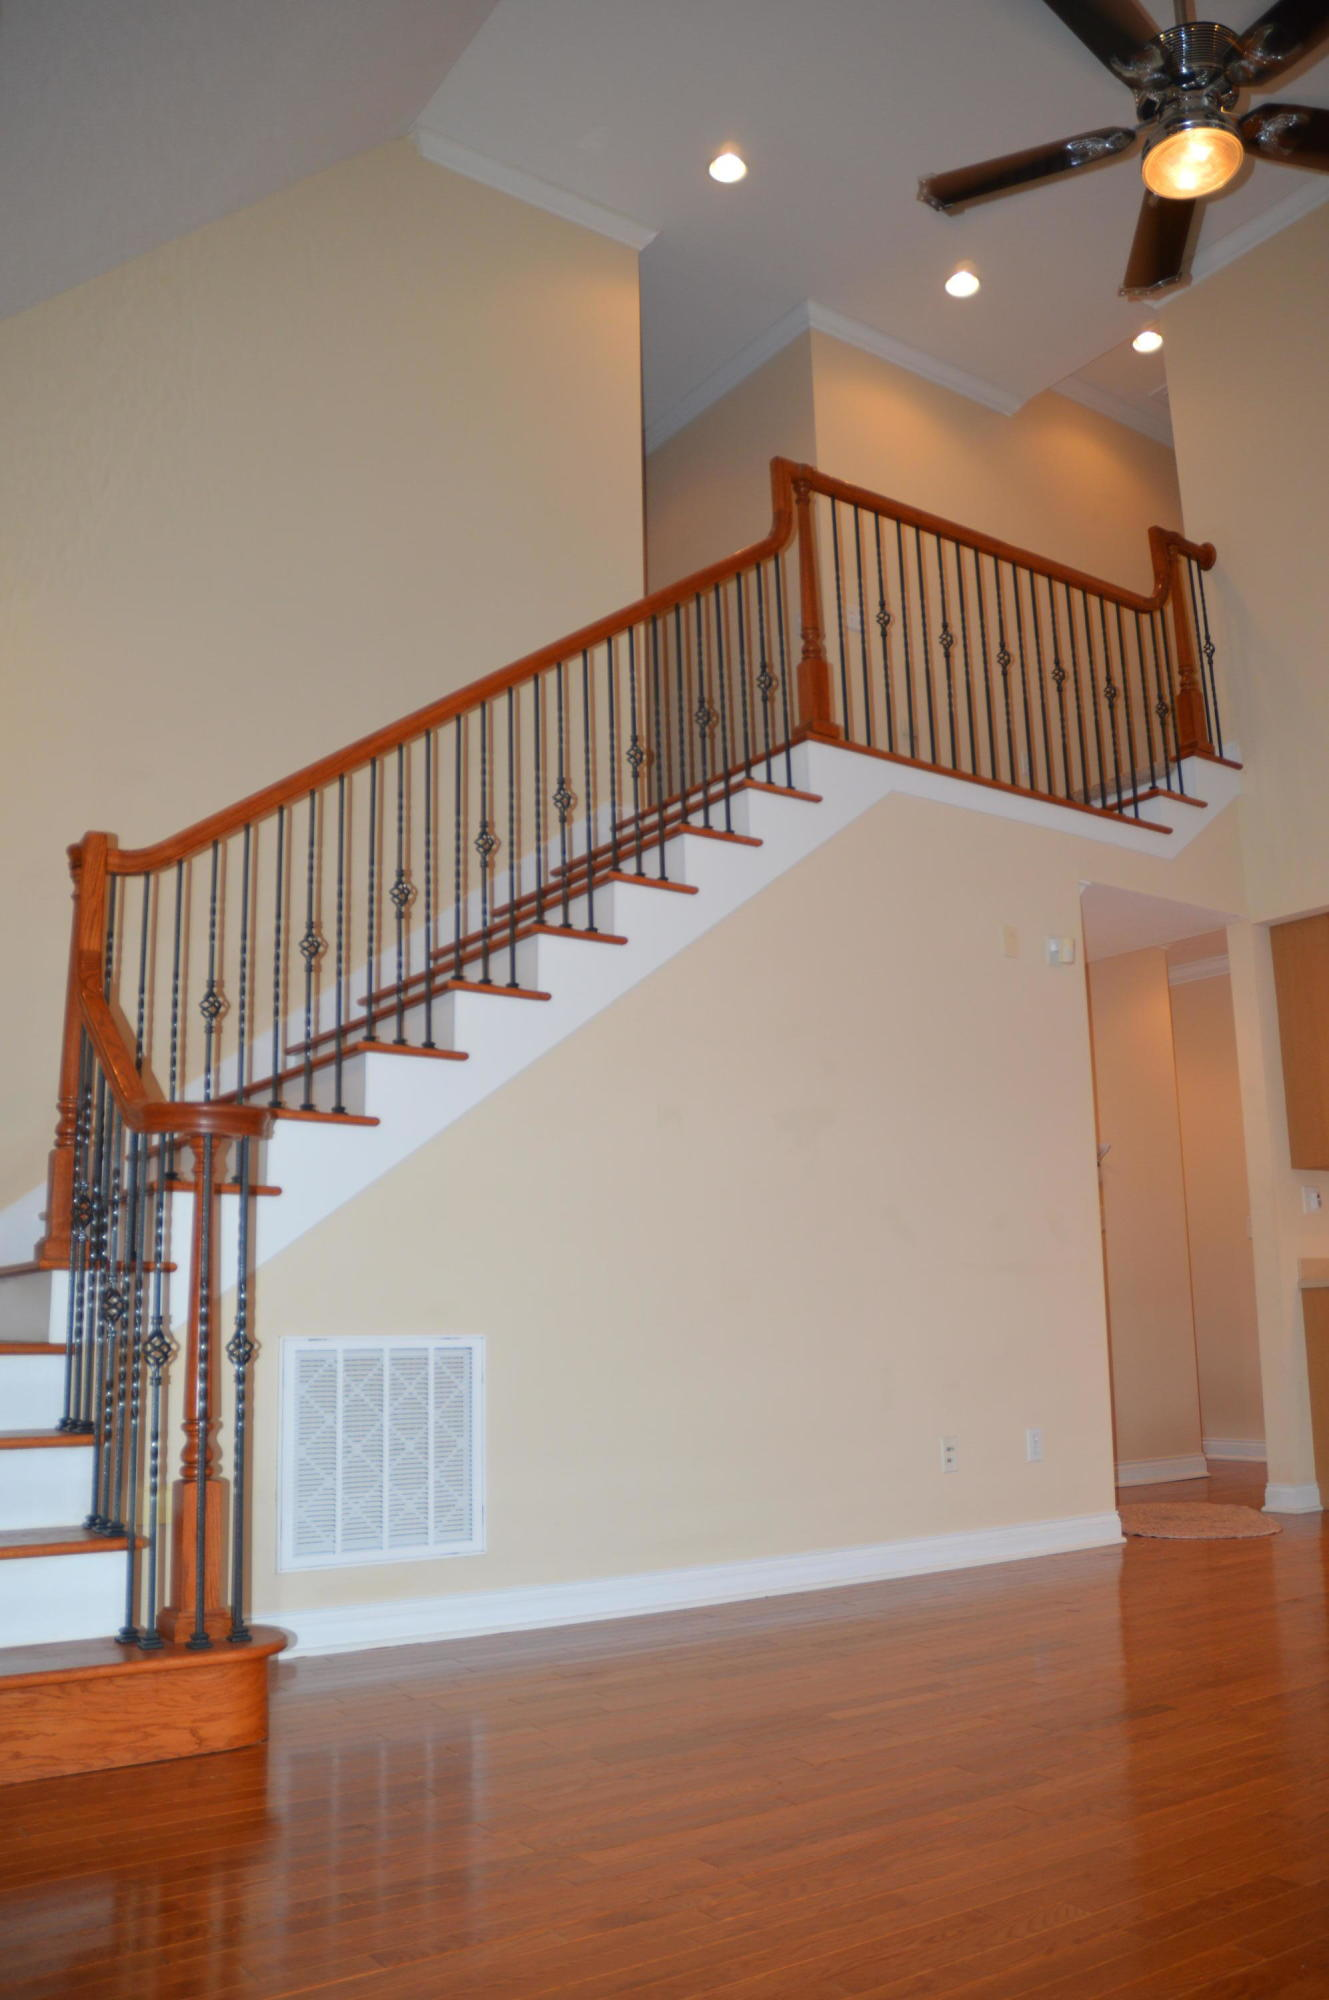 650 Green Ridge Rd, Seymour, Tennessee 37865, 3 Bedrooms Bedrooms, ,4 BathroomsBathrooms,Single Family,For Sale,Green Ridge,1056035